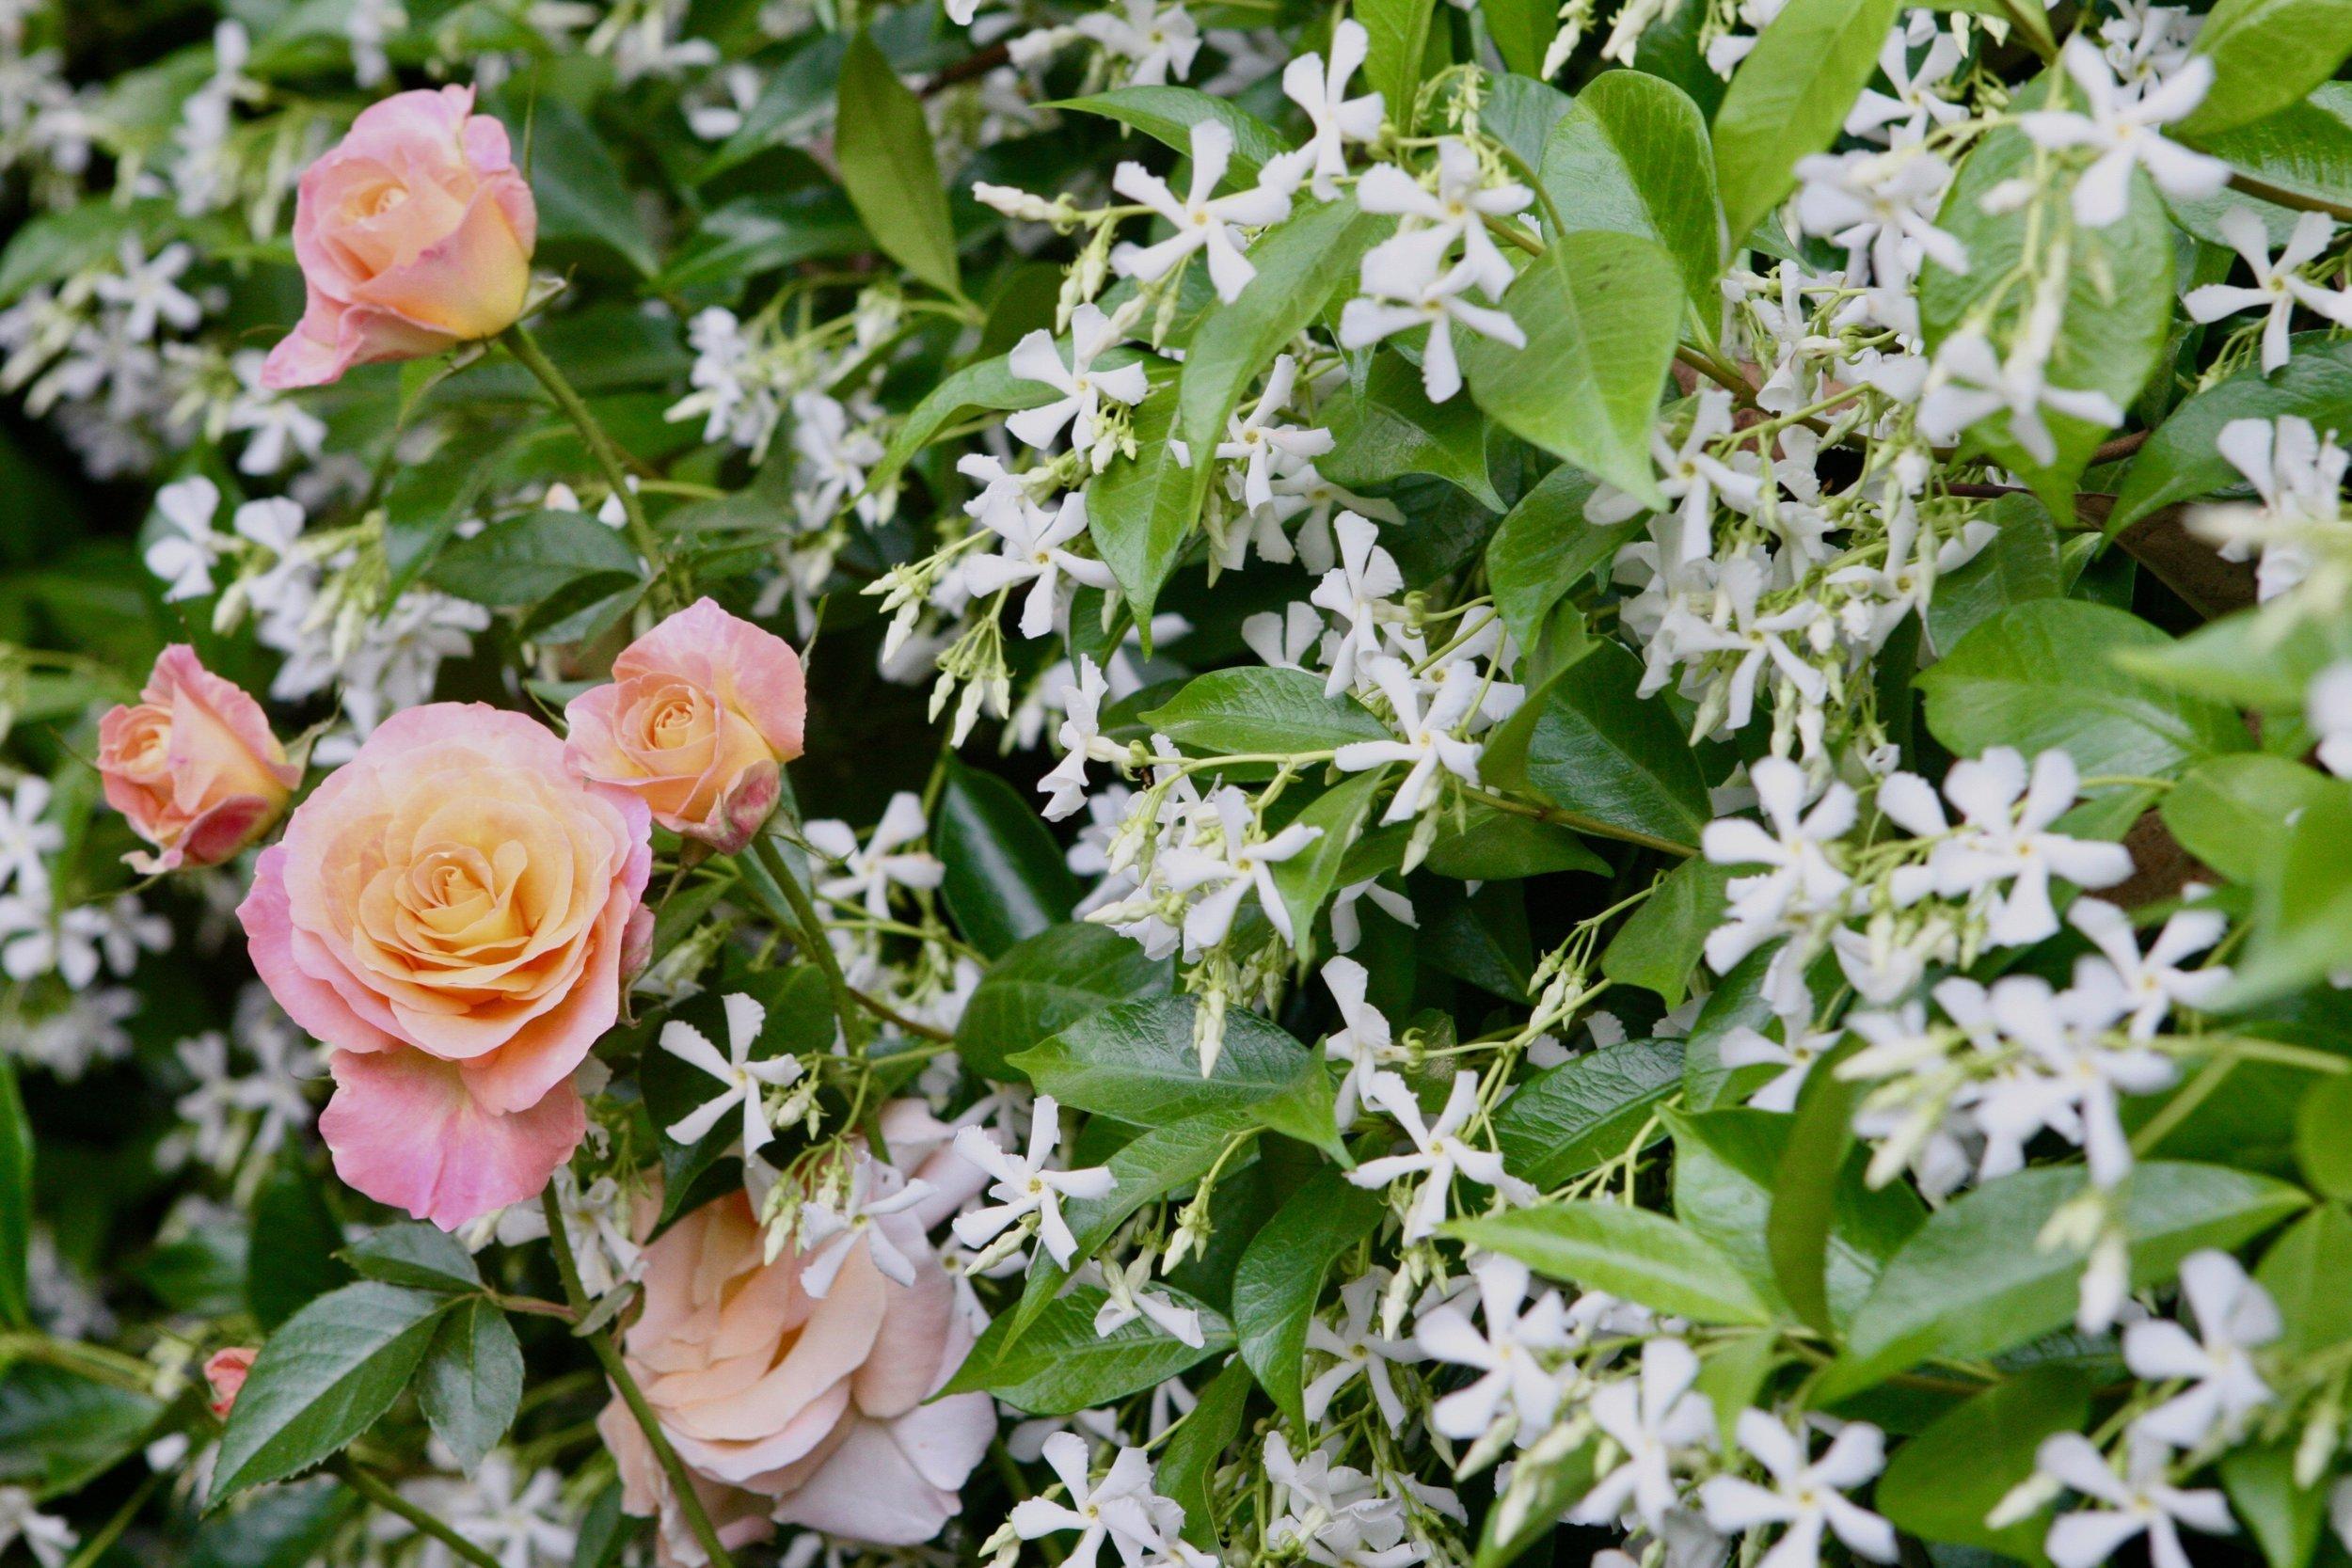 jasmine & roses1.jpg